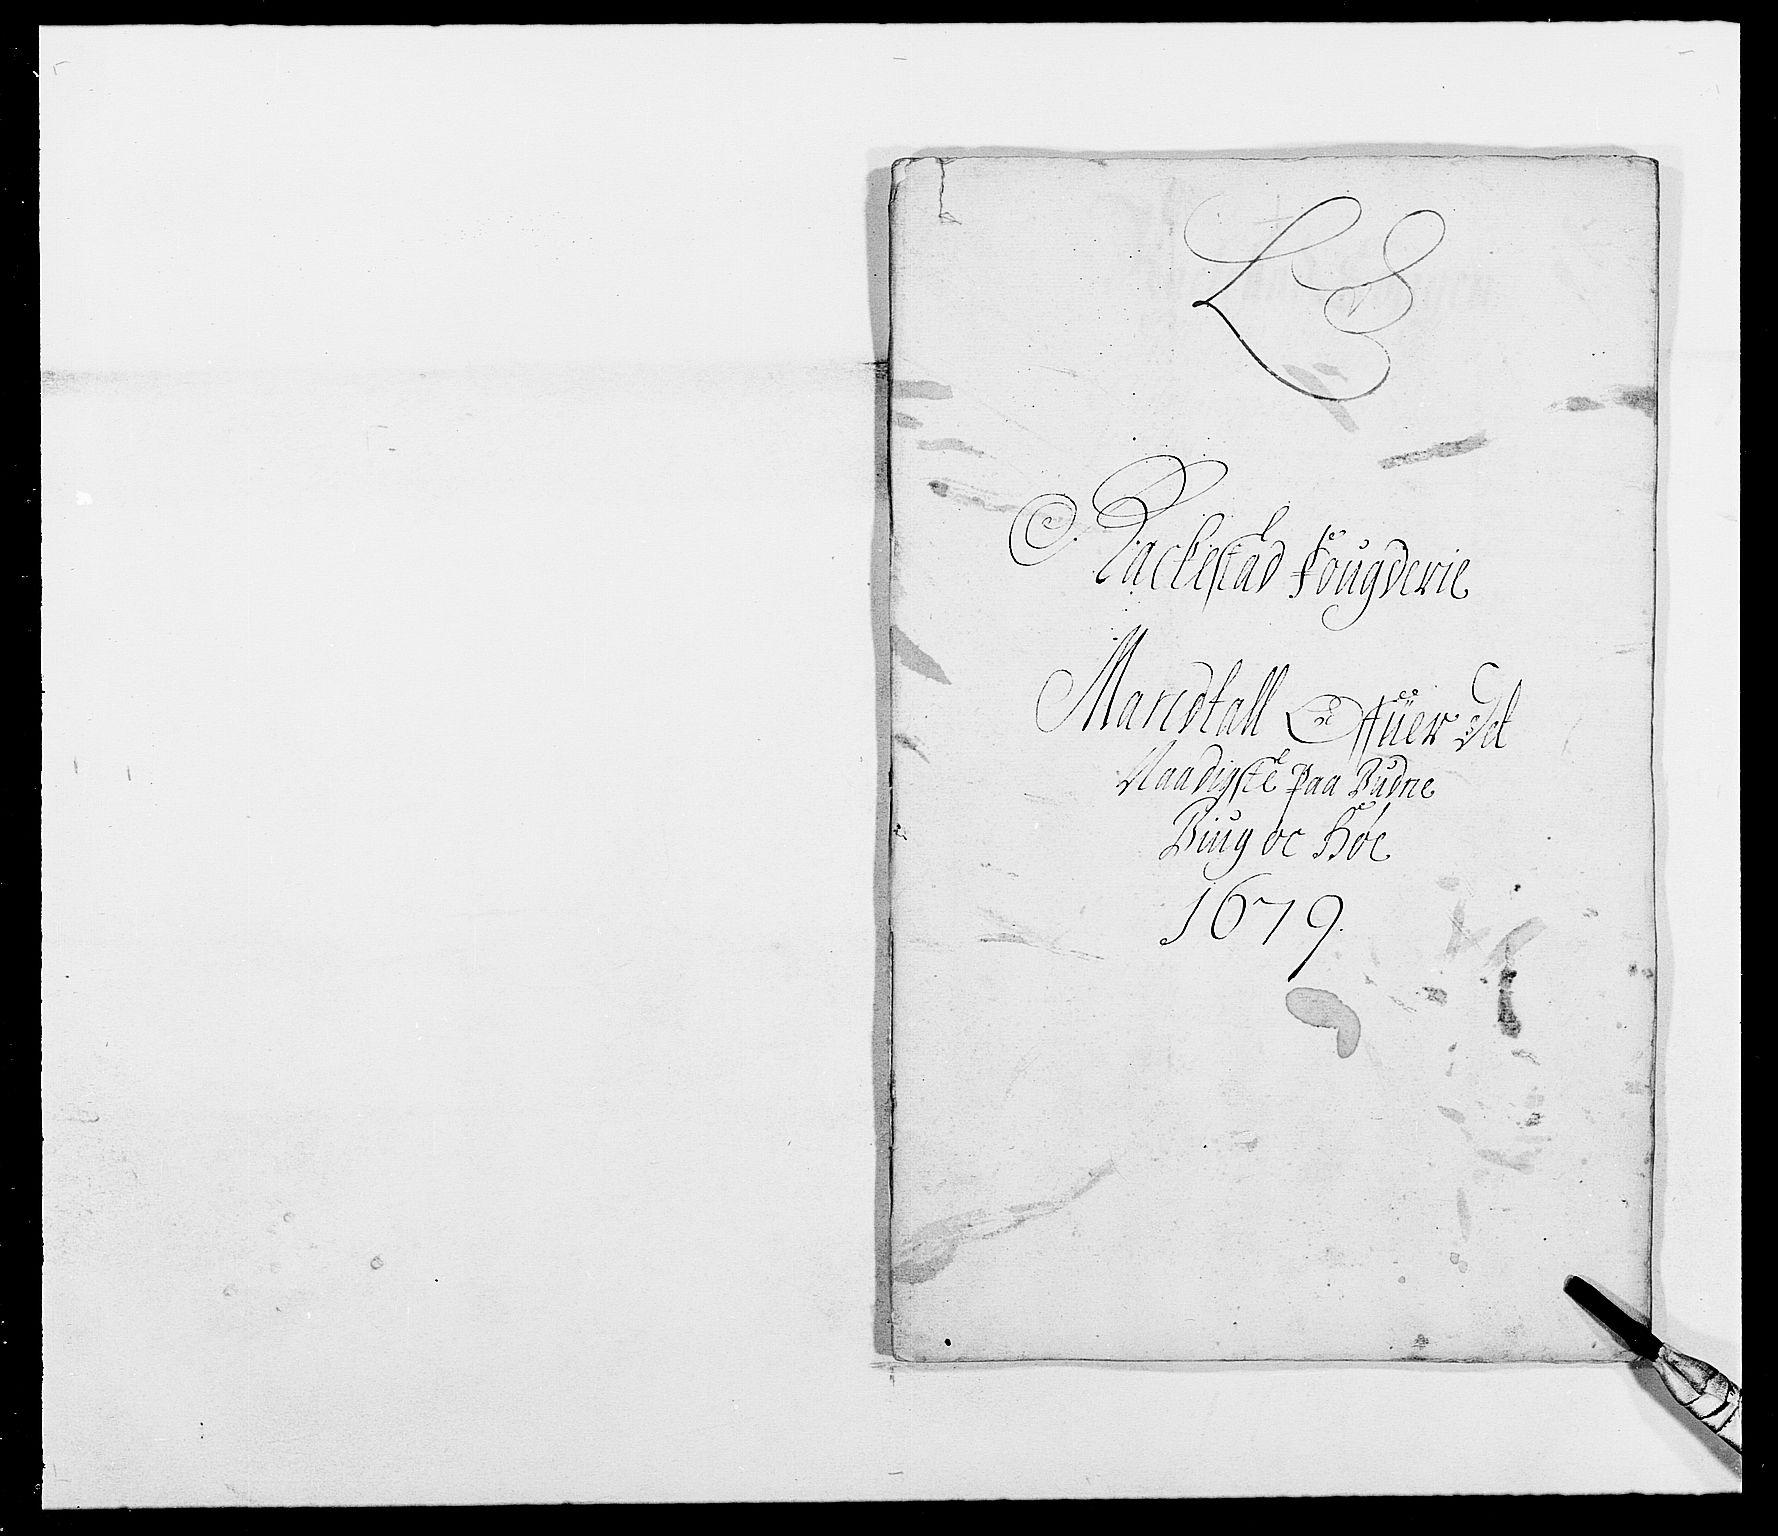 RA, Rentekammeret inntil 1814, Reviderte regnskaper, Fogderegnskap, R05/L0271: Fogderegnskap Rakkestad, 1678-1679, s. 414